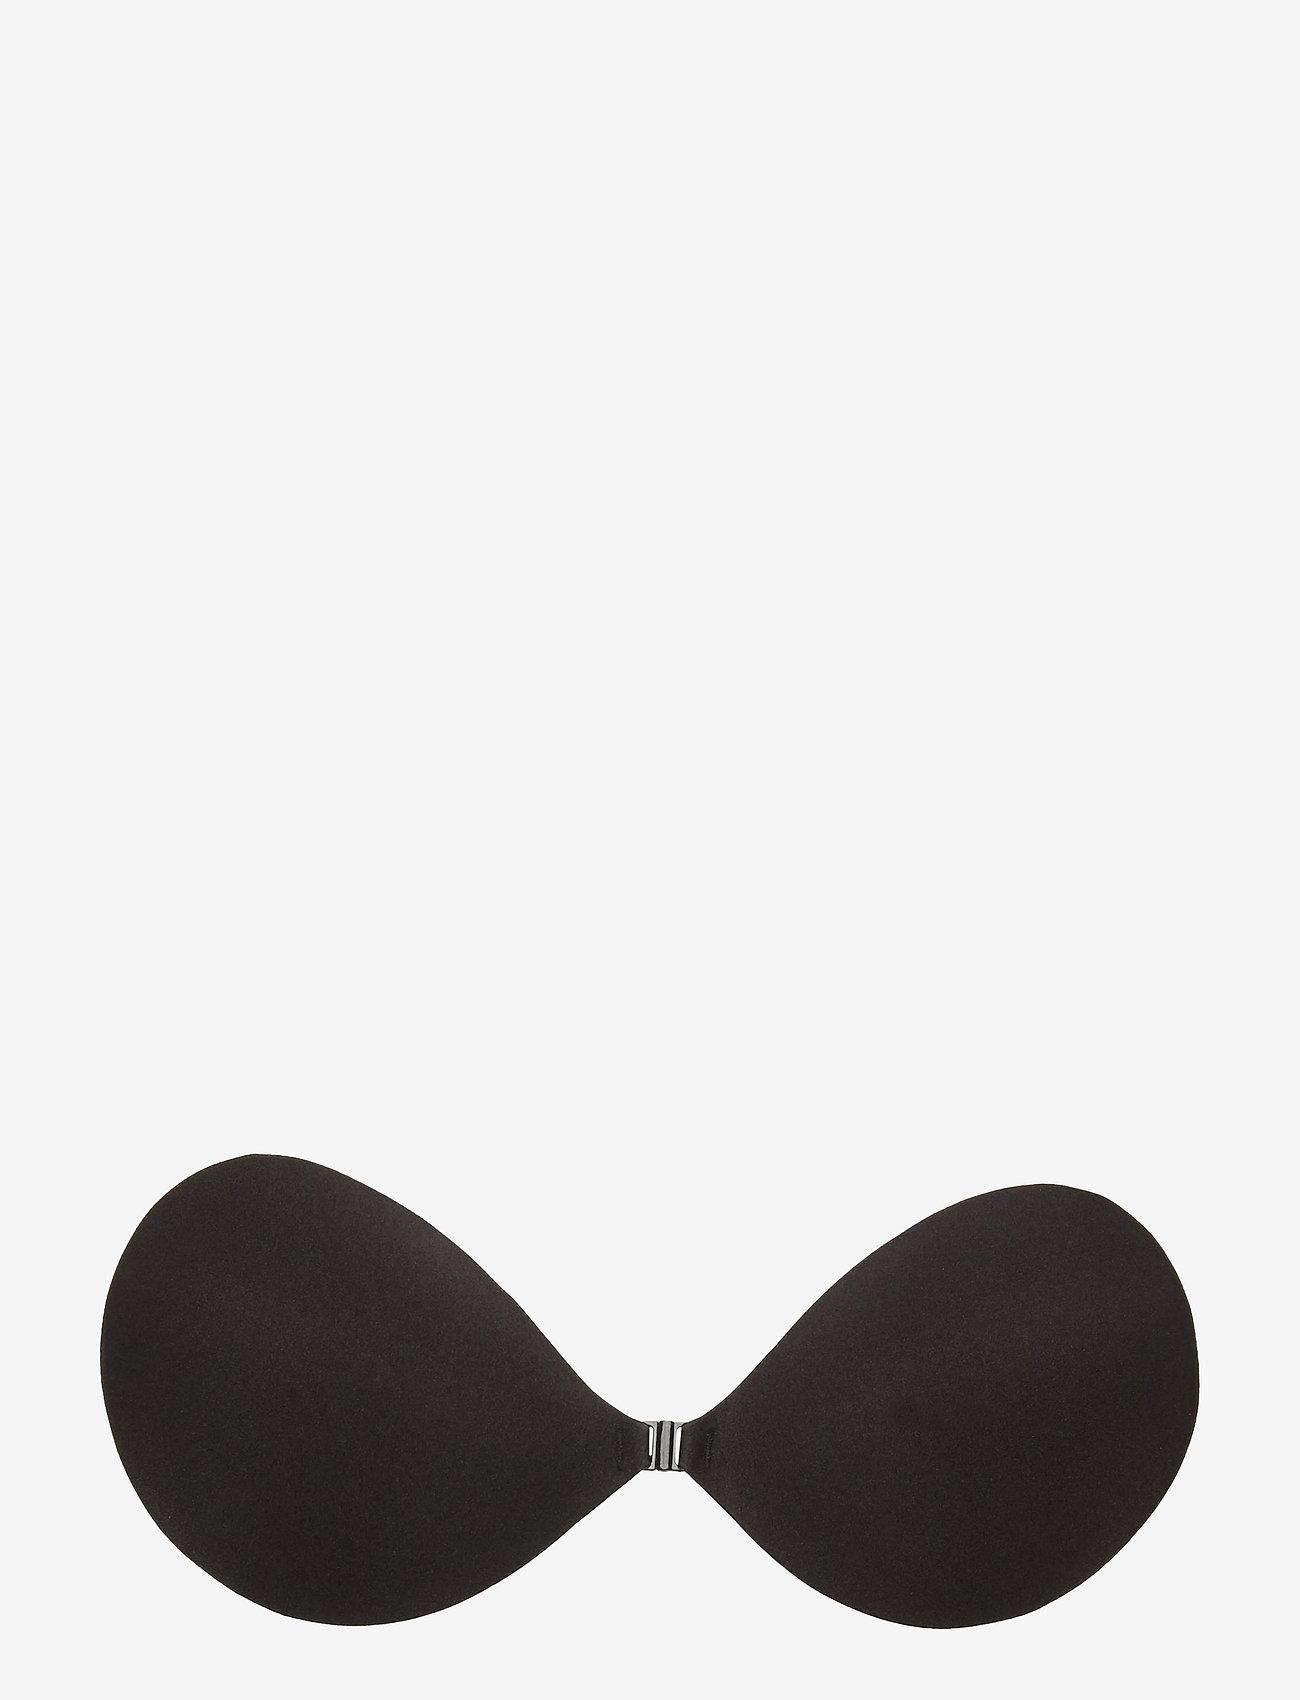 Hunkemöller - Stick on bra - bra accessories - black - 0